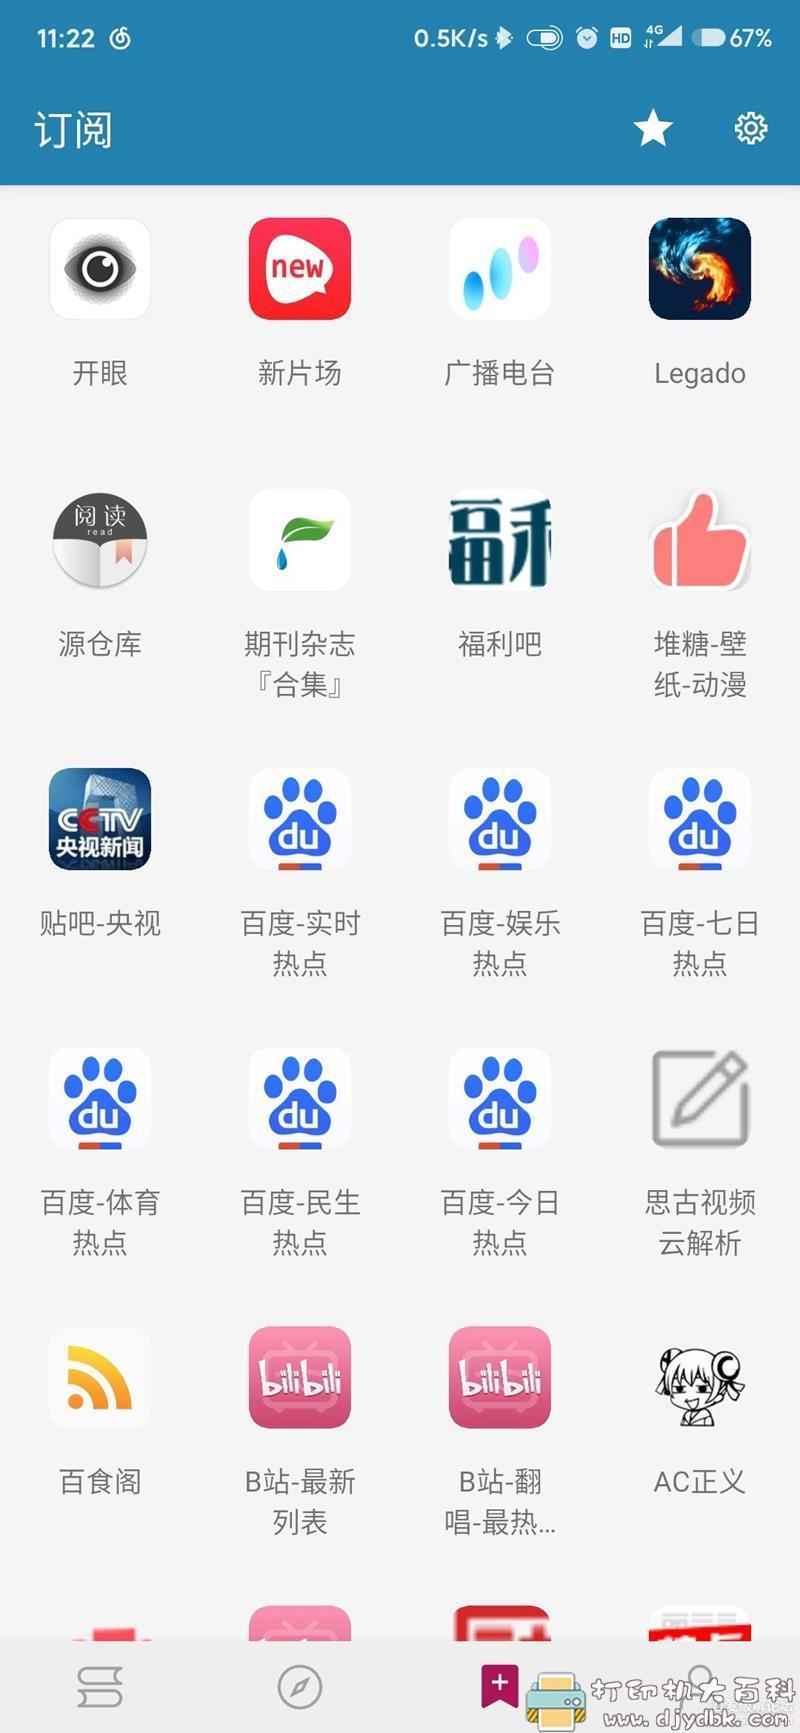 [Android]两个阅读软件,一个漫画软件推荐,内含大量阅读书源图片 No.6